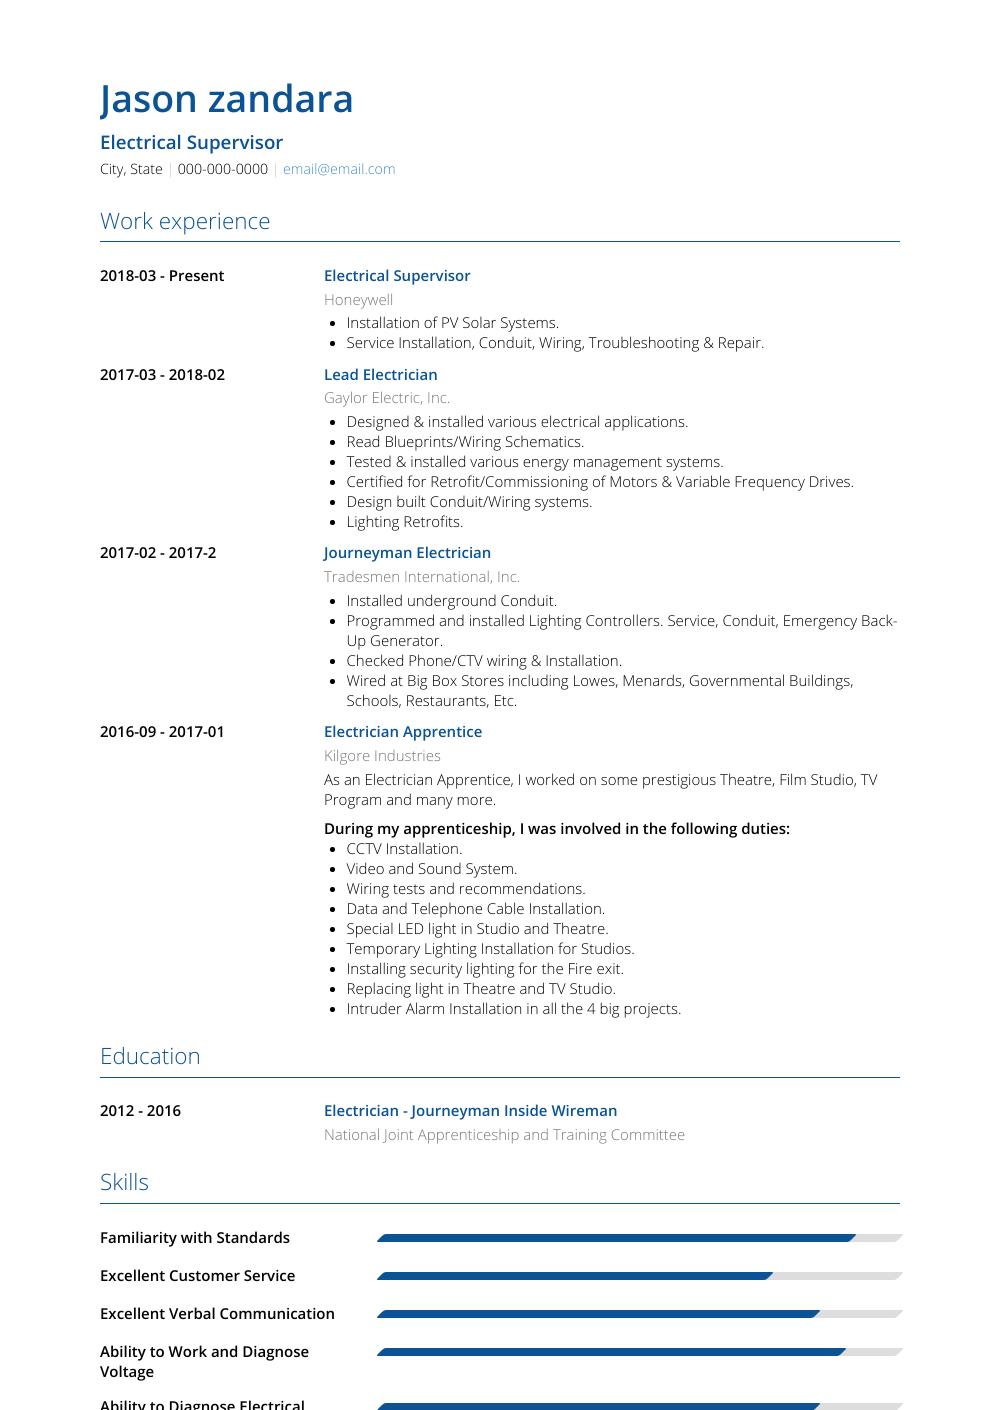 Electrician - Resume Samples & Templates | VisualCV